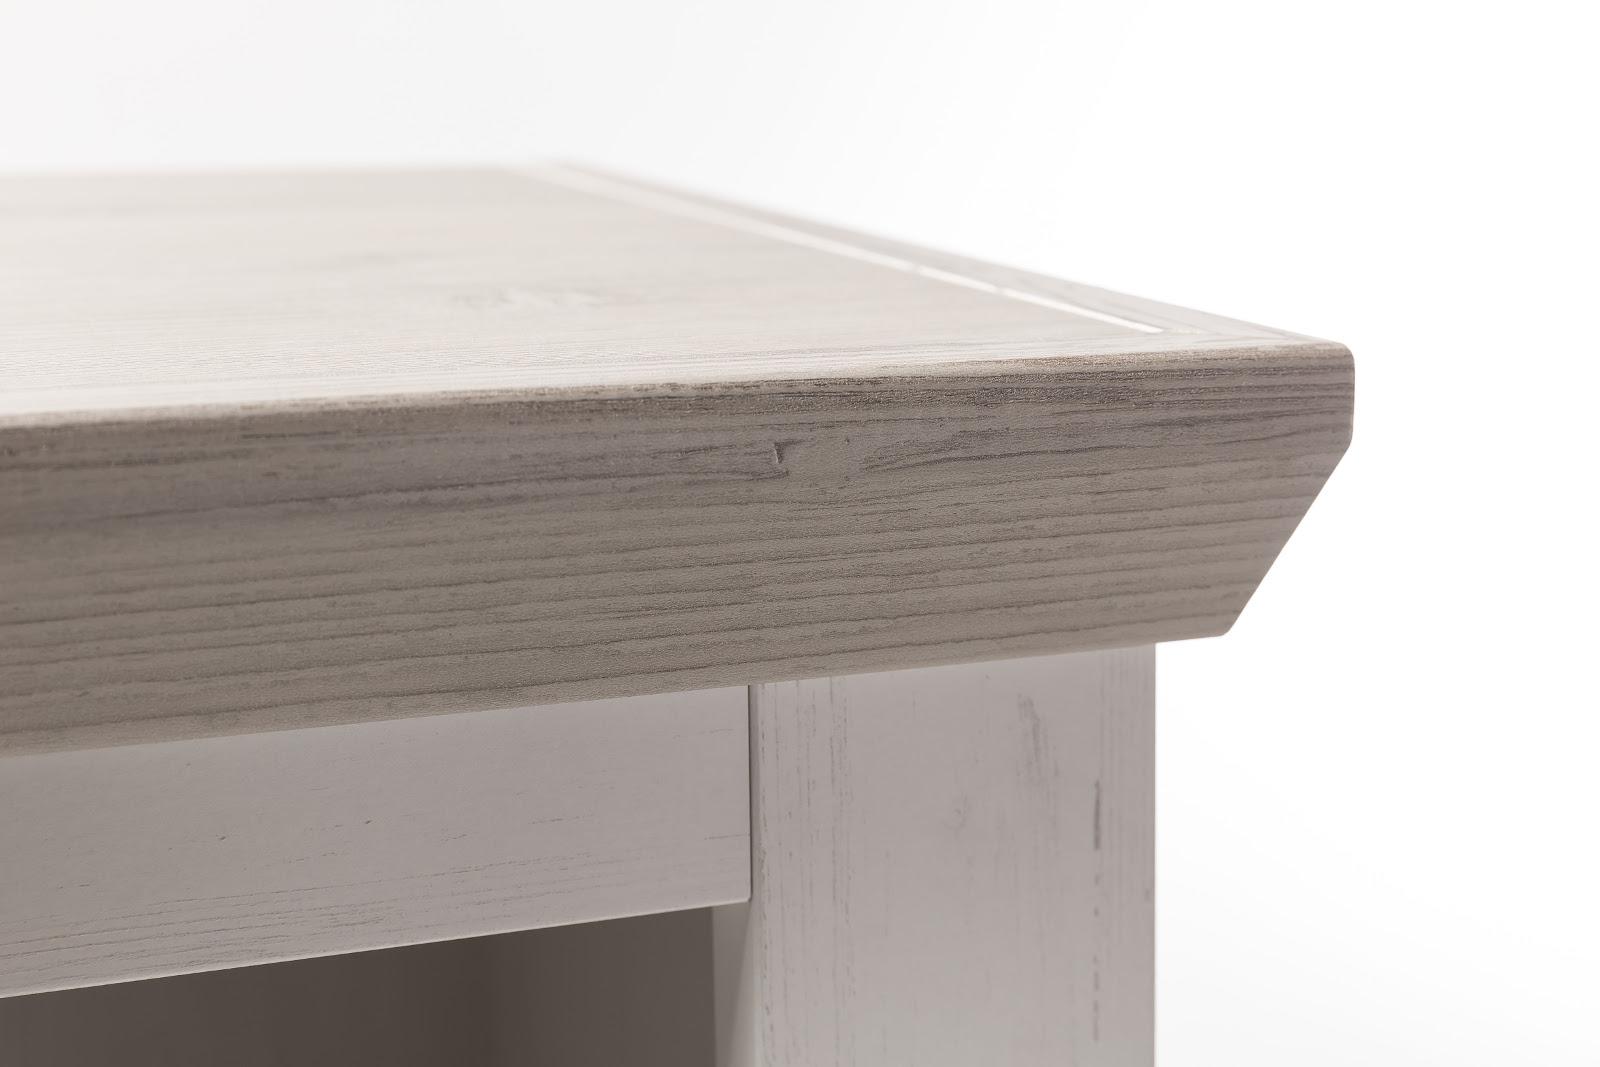 wandregal wandboard weiss pinie struktur garderobe. Black Bedroom Furniture Sets. Home Design Ideas